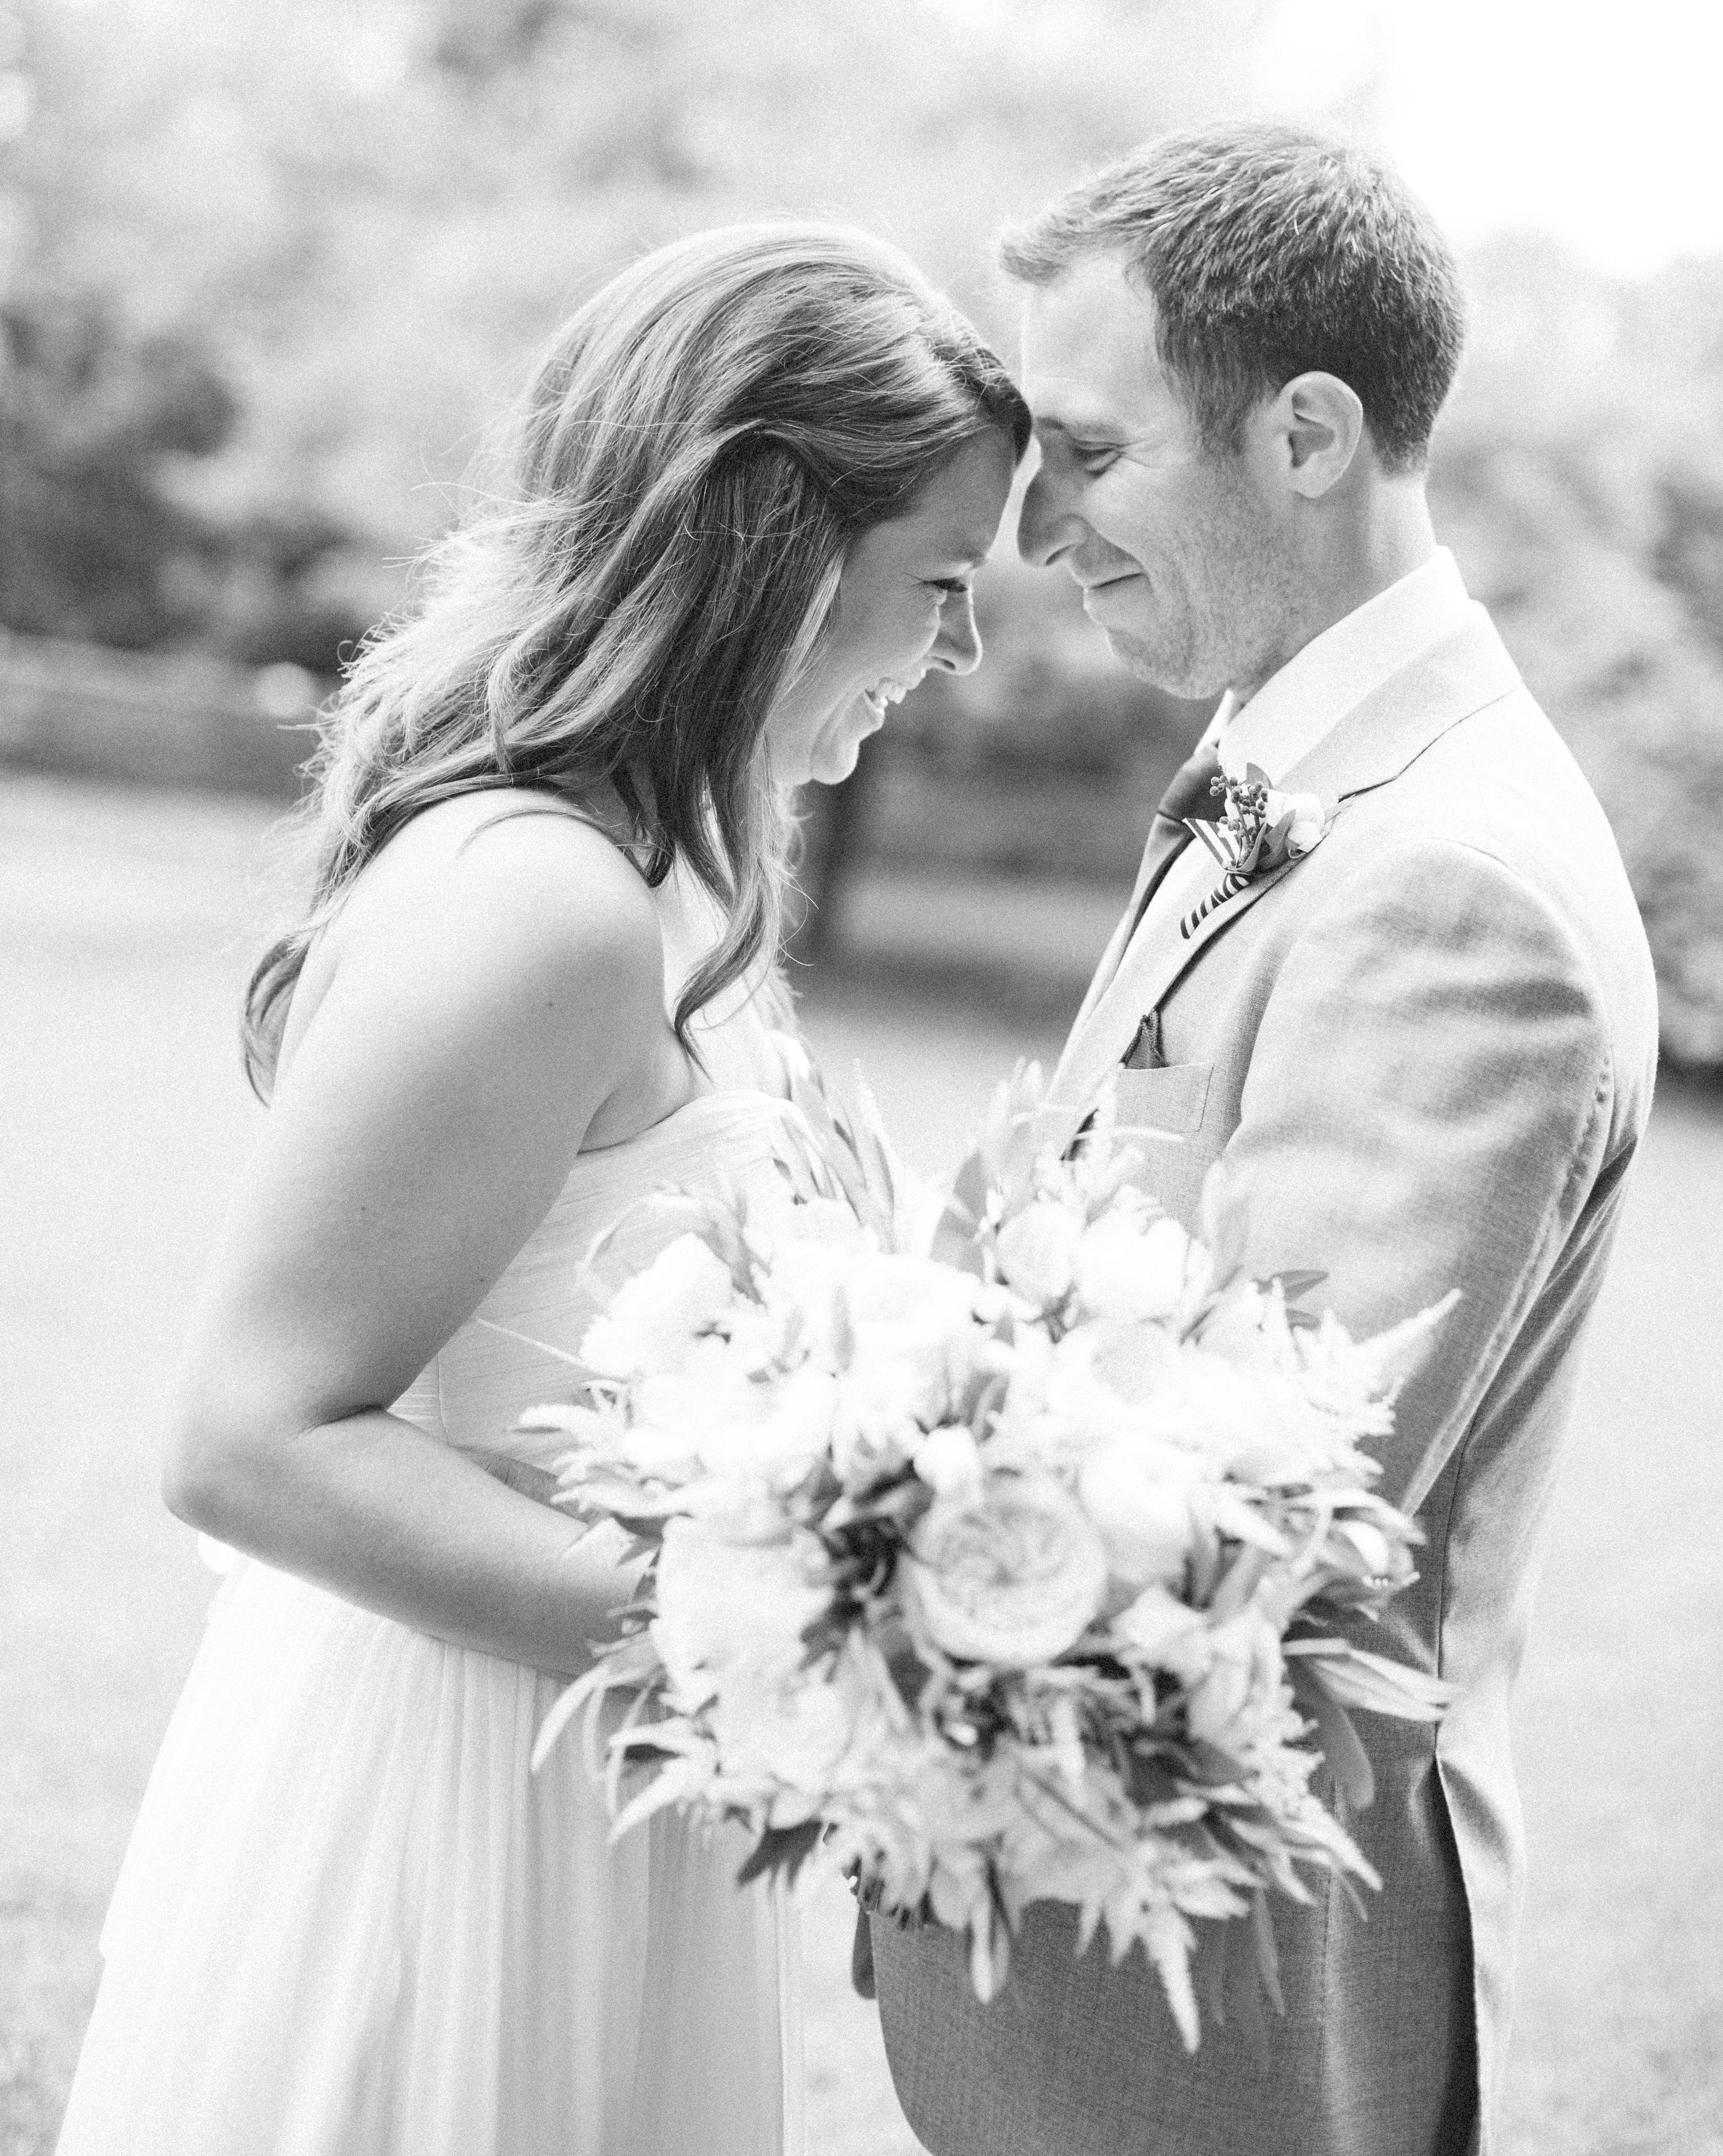 kristen-jonathan-wedding-couple-0532-s112193-1015.jpg